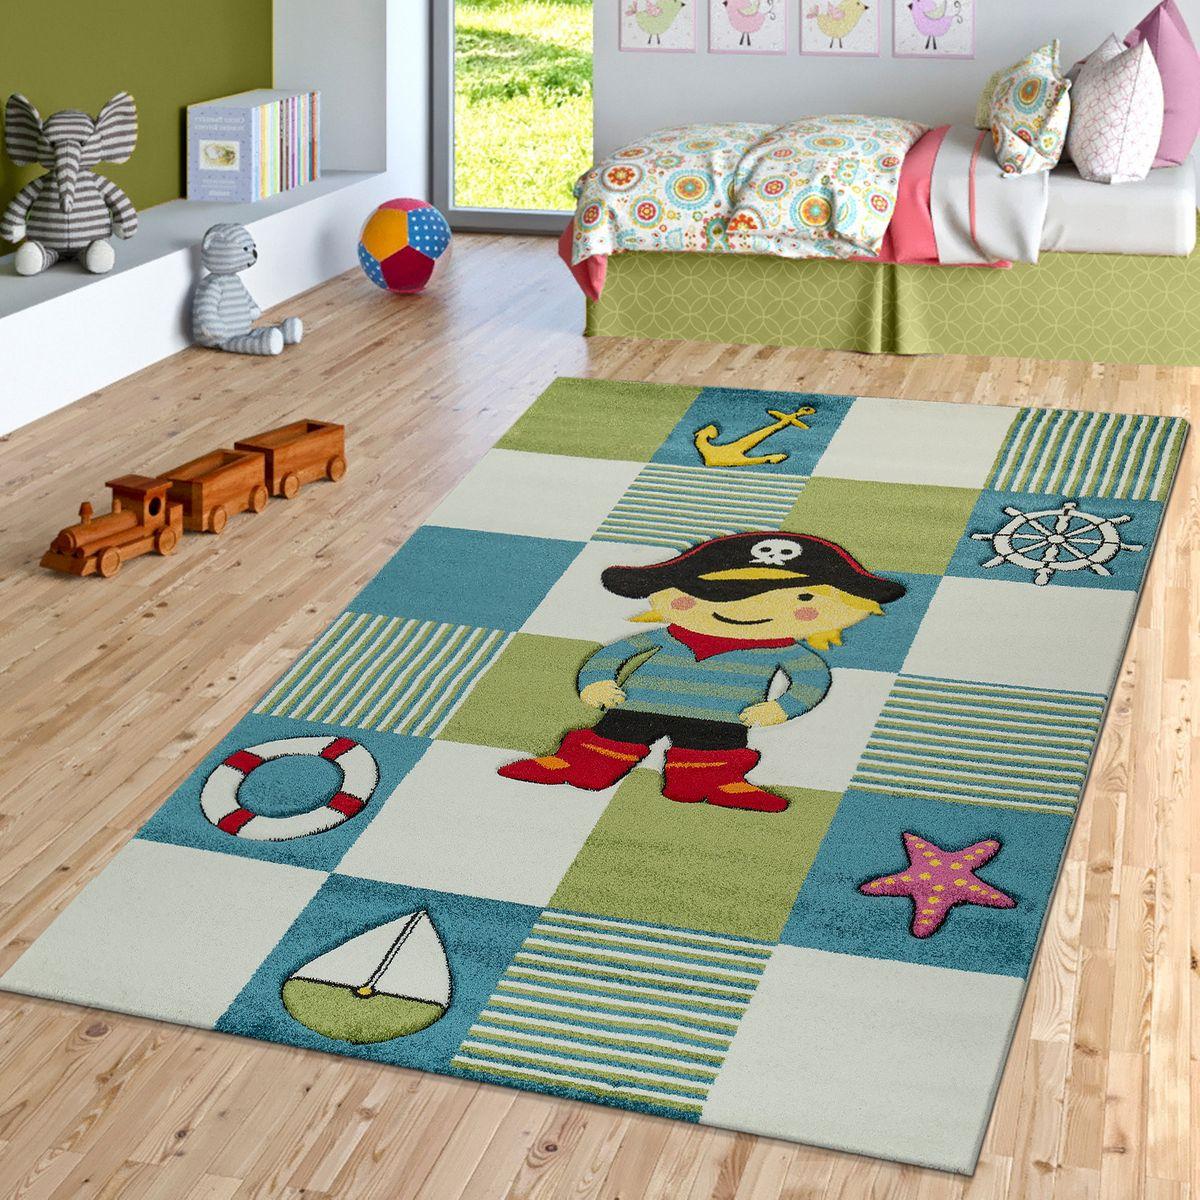 Full Size of Piraten Kinderzimmer Teppich Look Blau Grn Teppichmax Regal Weiß Regale Sofa Kinderzimmer Piraten Kinderzimmer